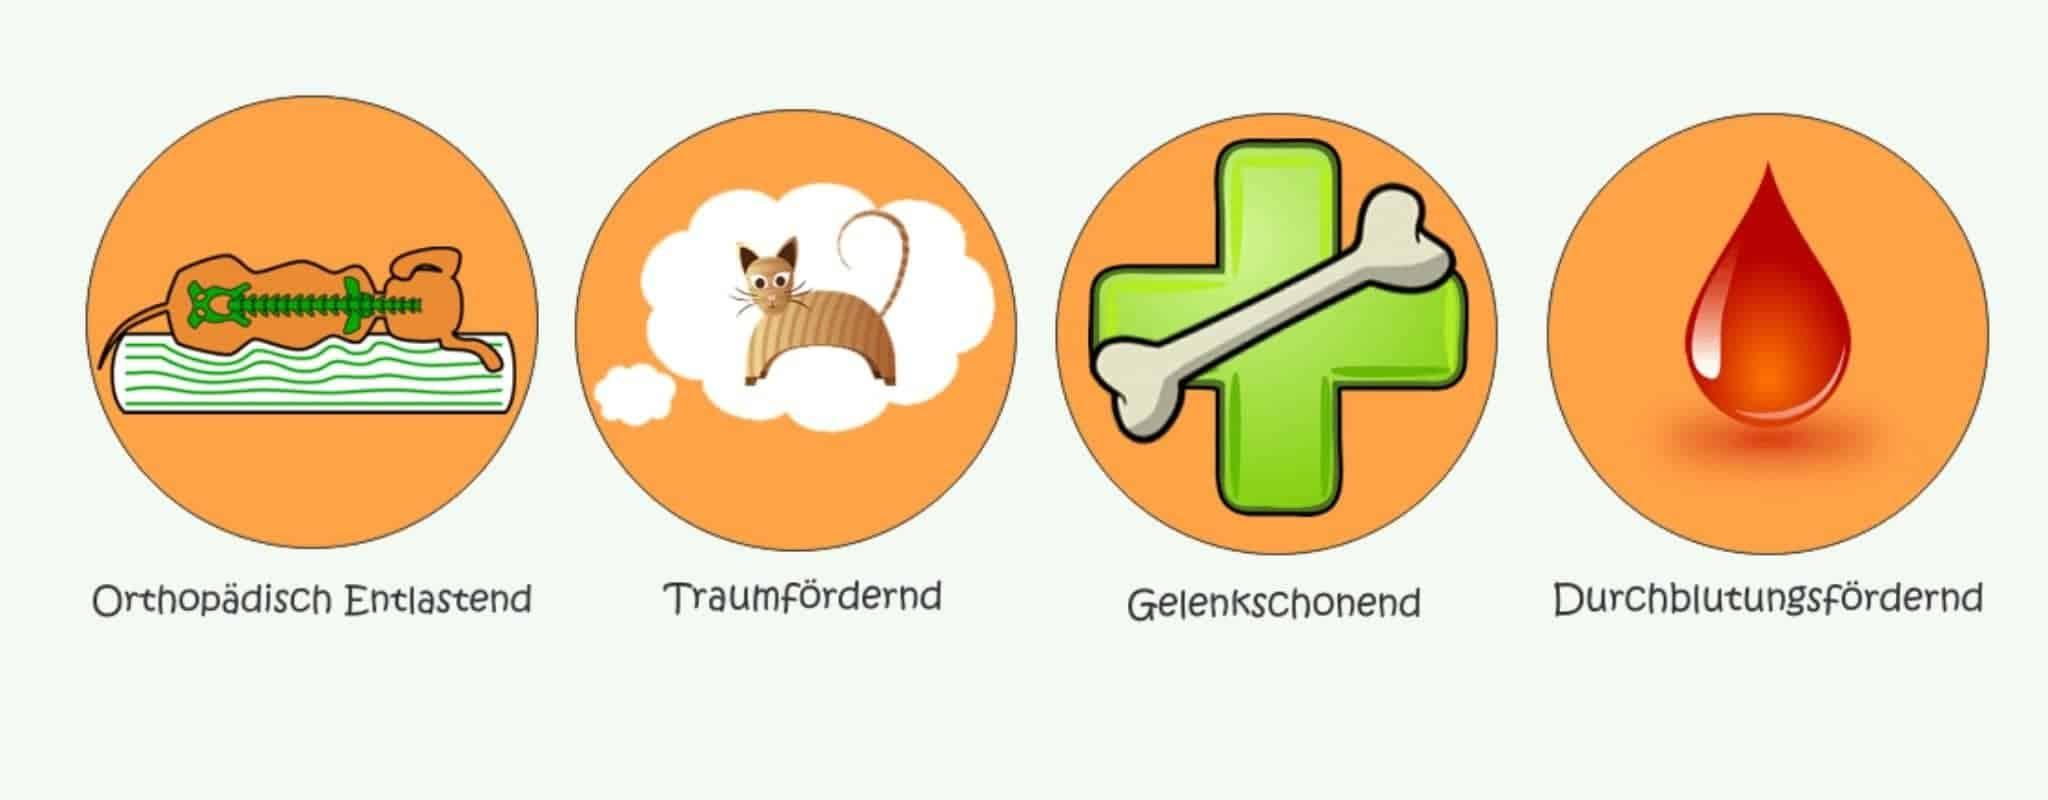 Vorteile orthopädischer Hundebetten Infografik